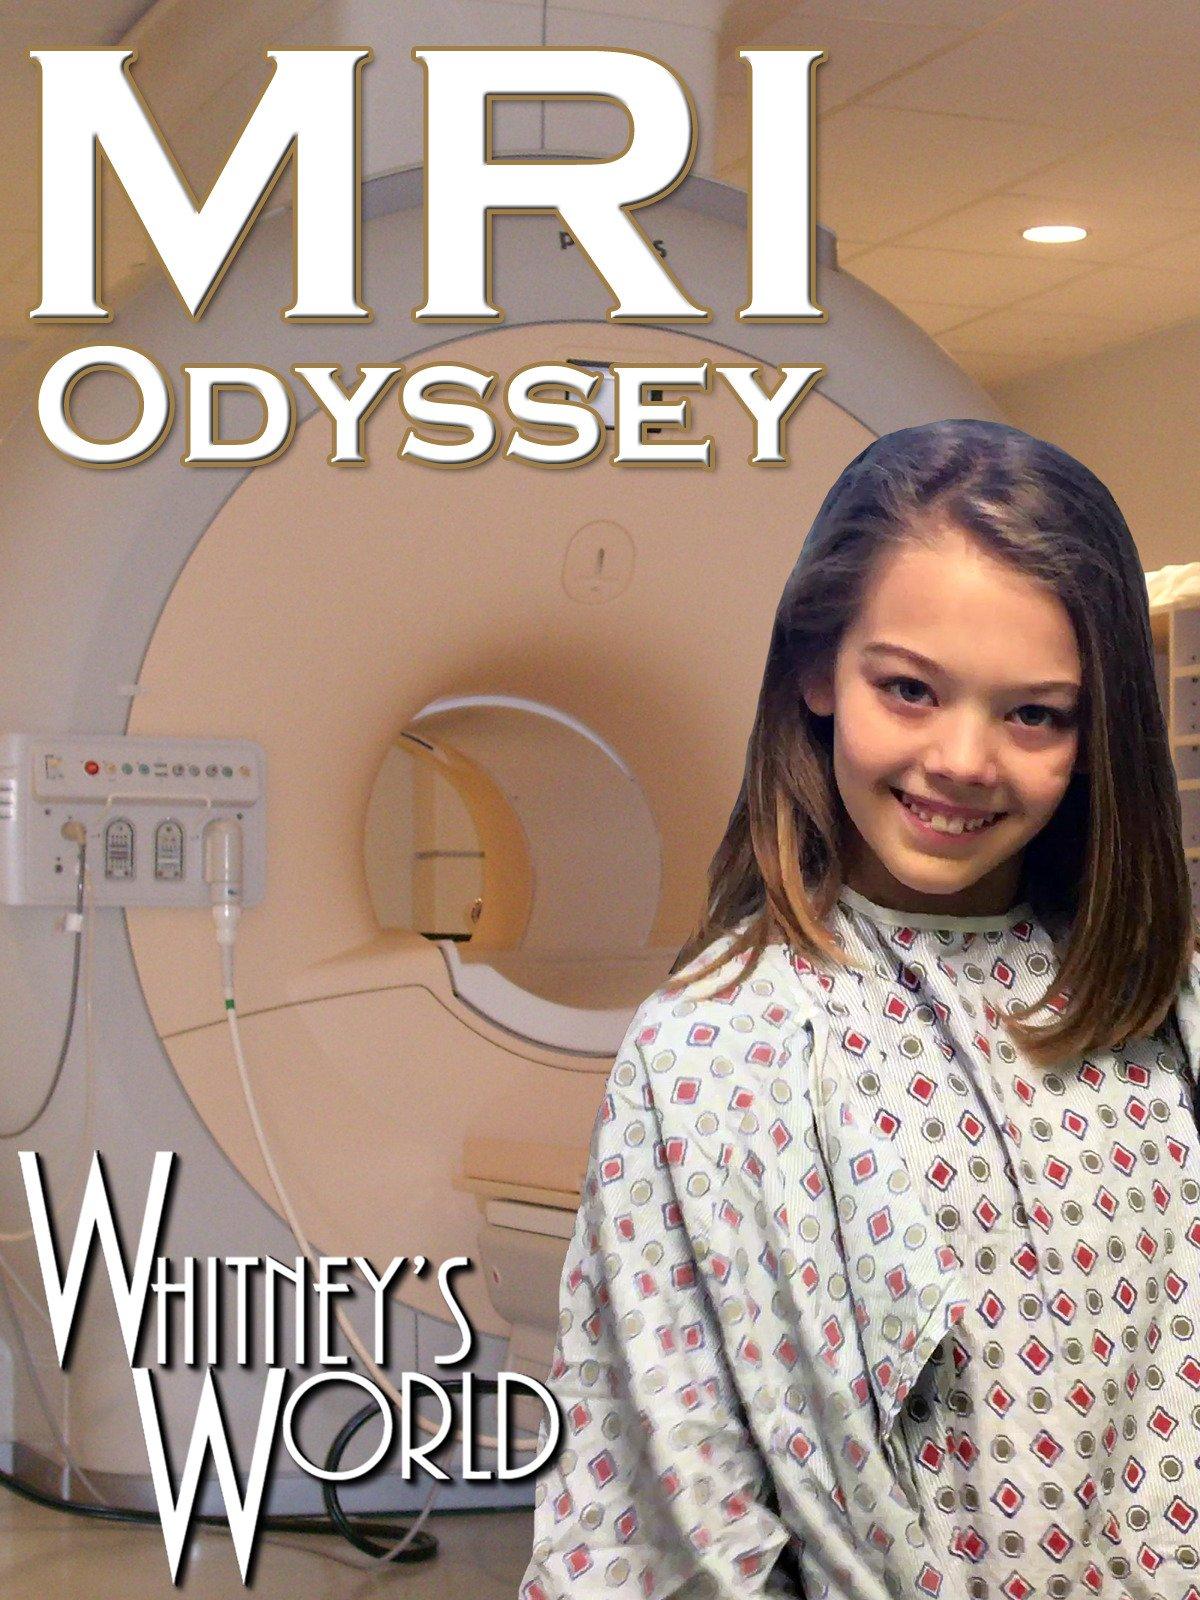 MRI Odyssey